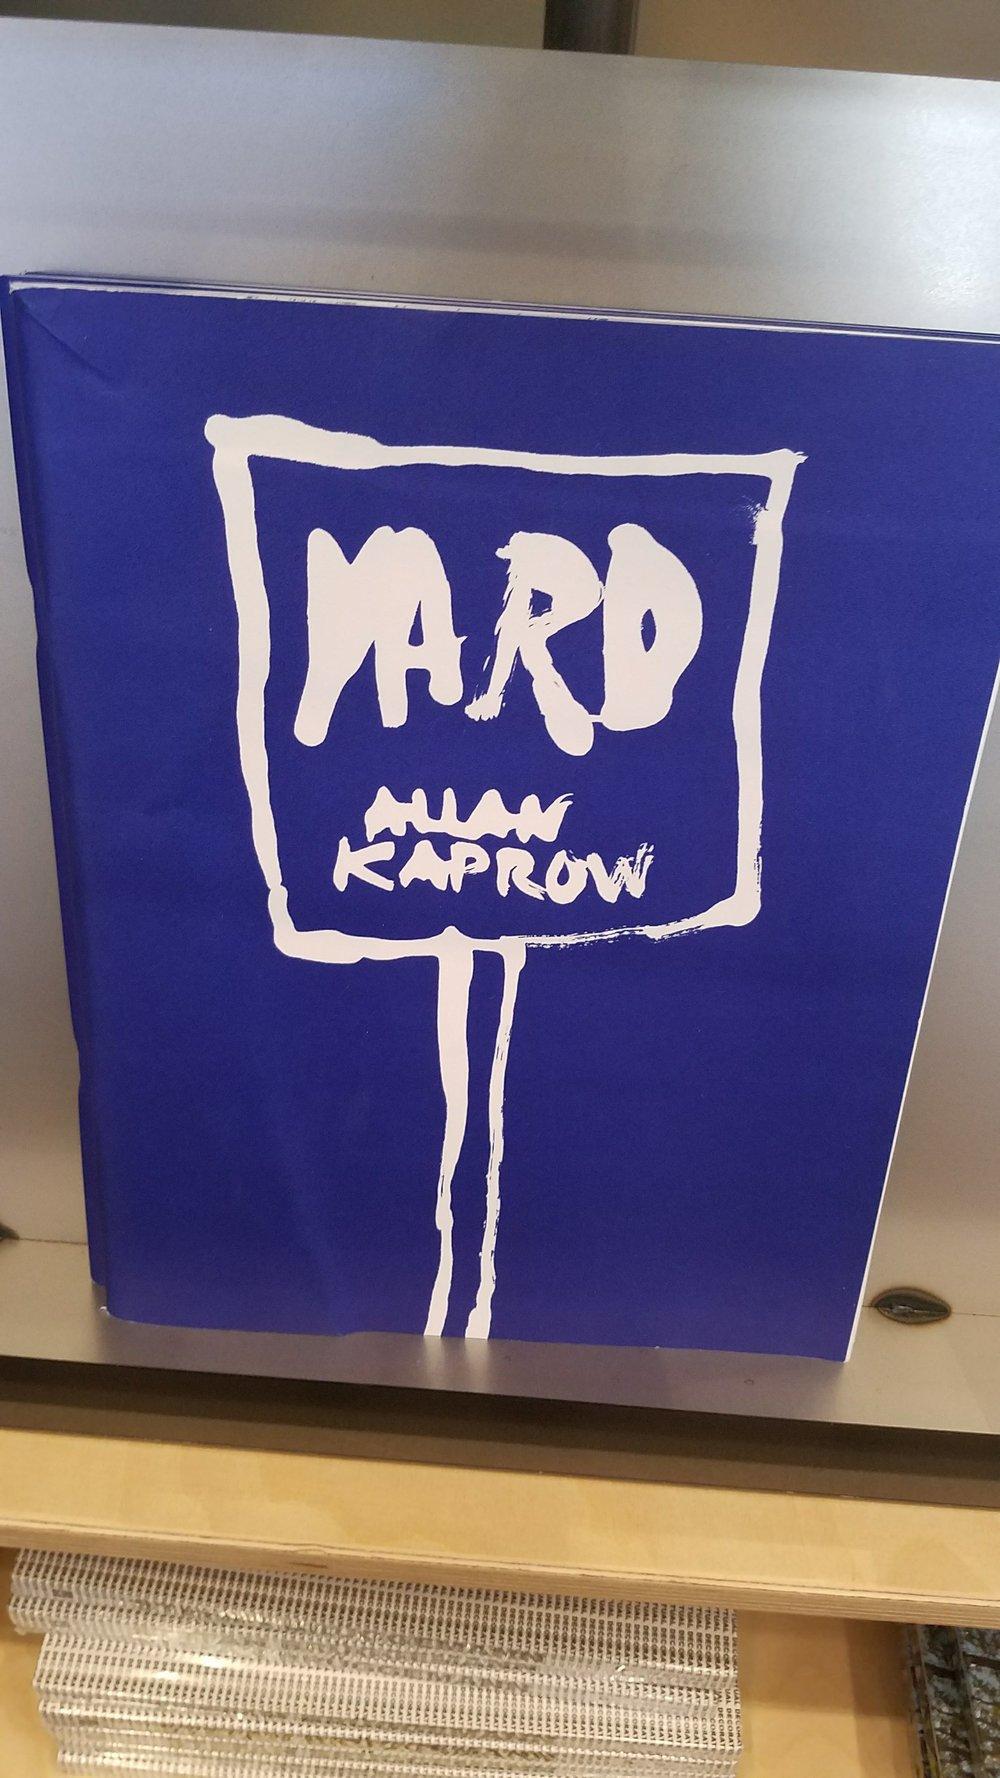 8. Allan Kaprow, Yard, H&W (Bookstore)Image2.jpg